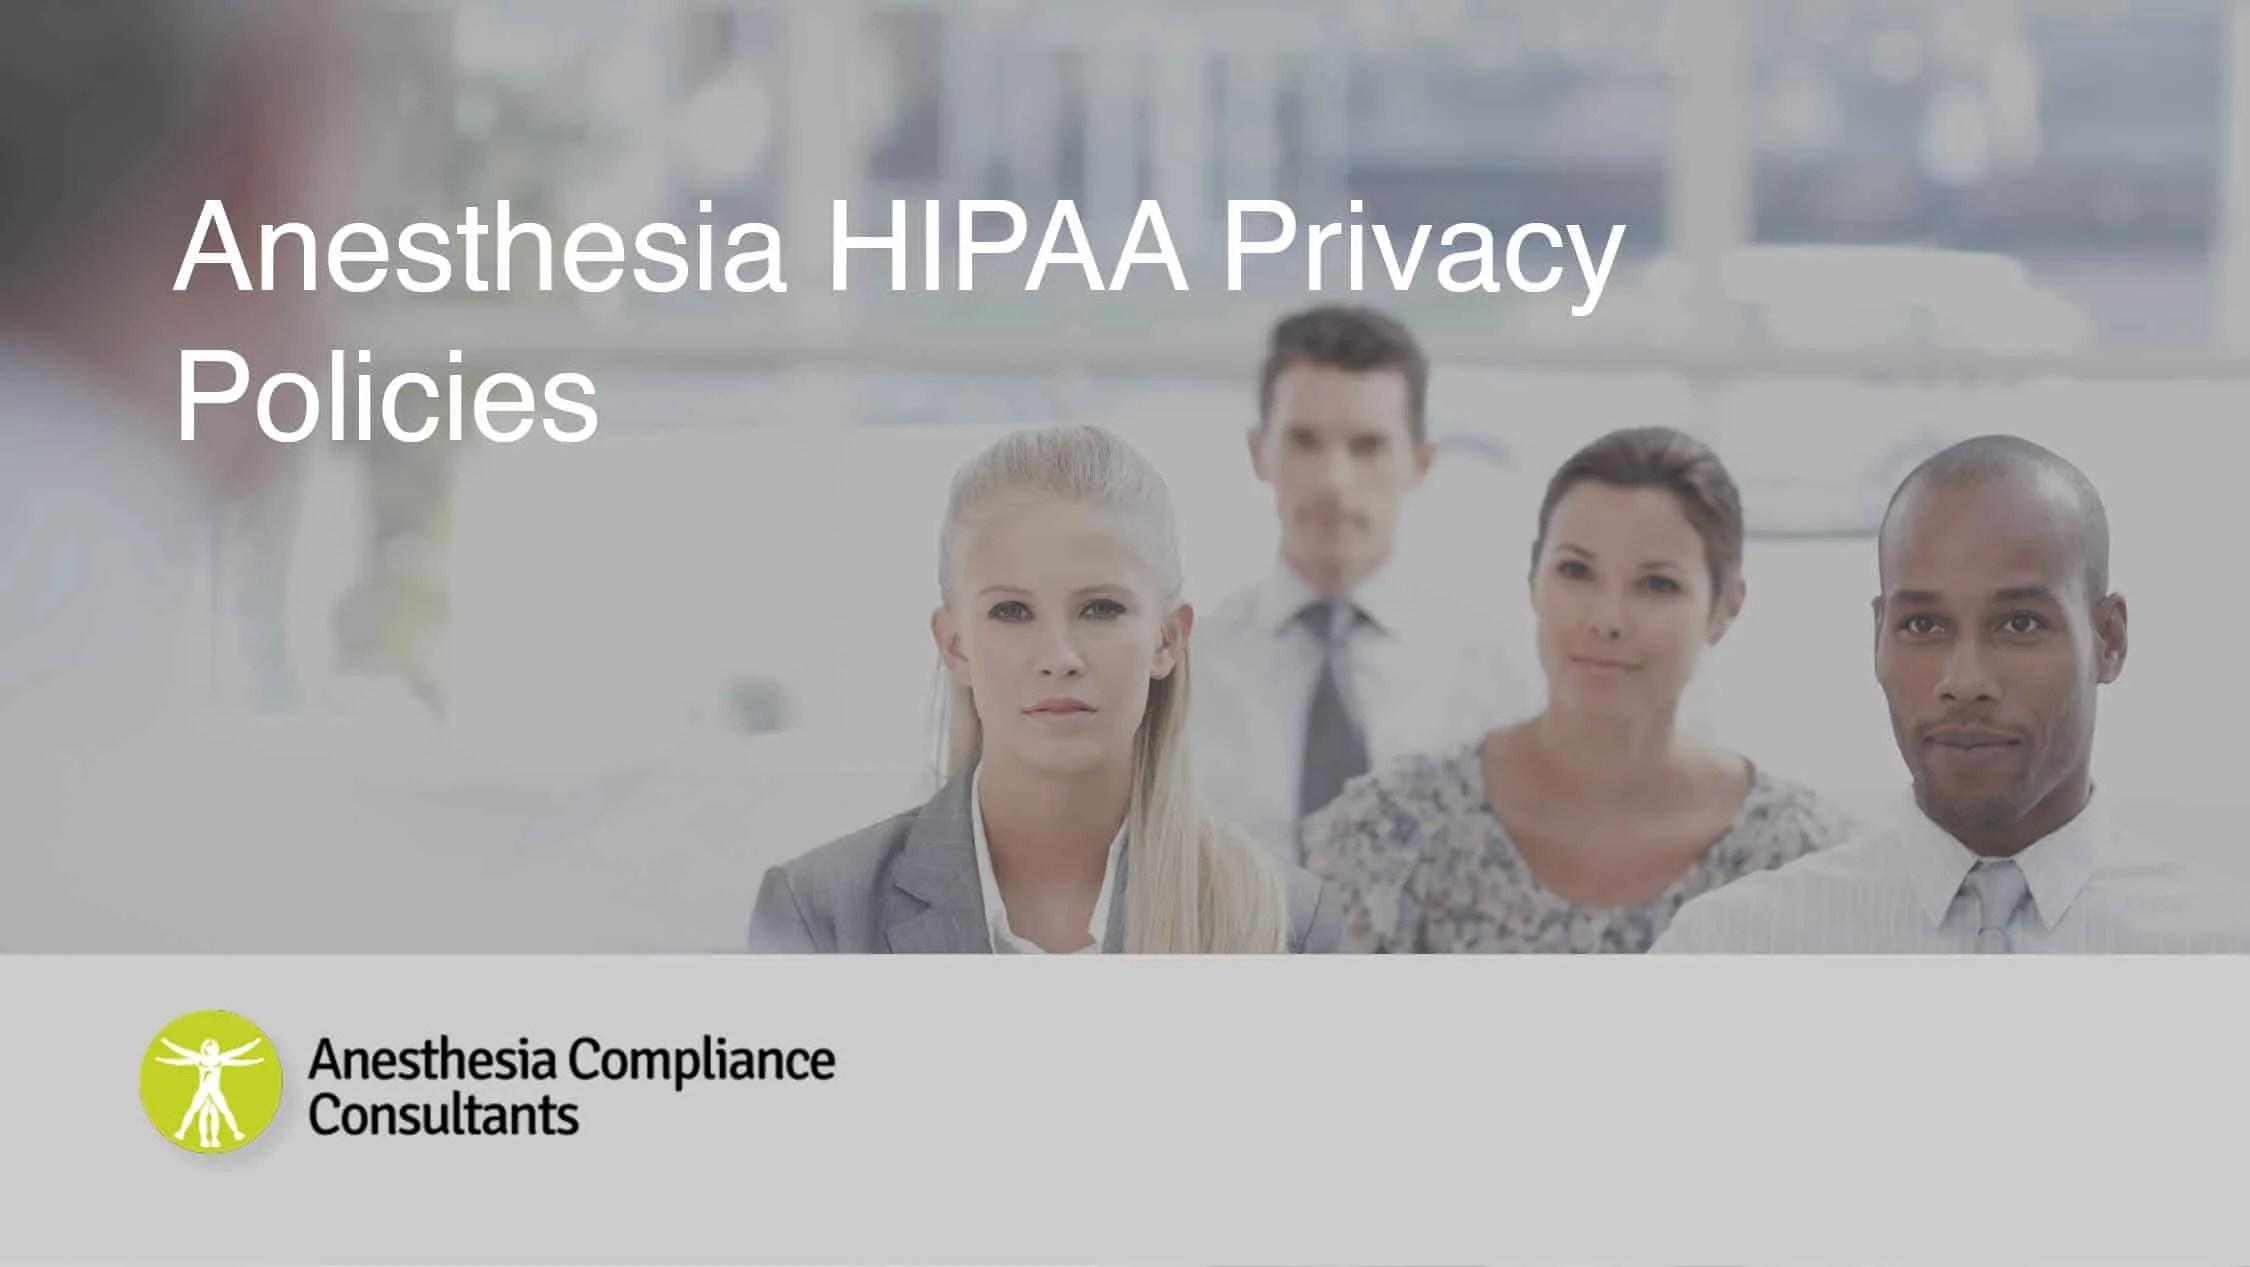 Anesthesia HIPAA Privacy Policies